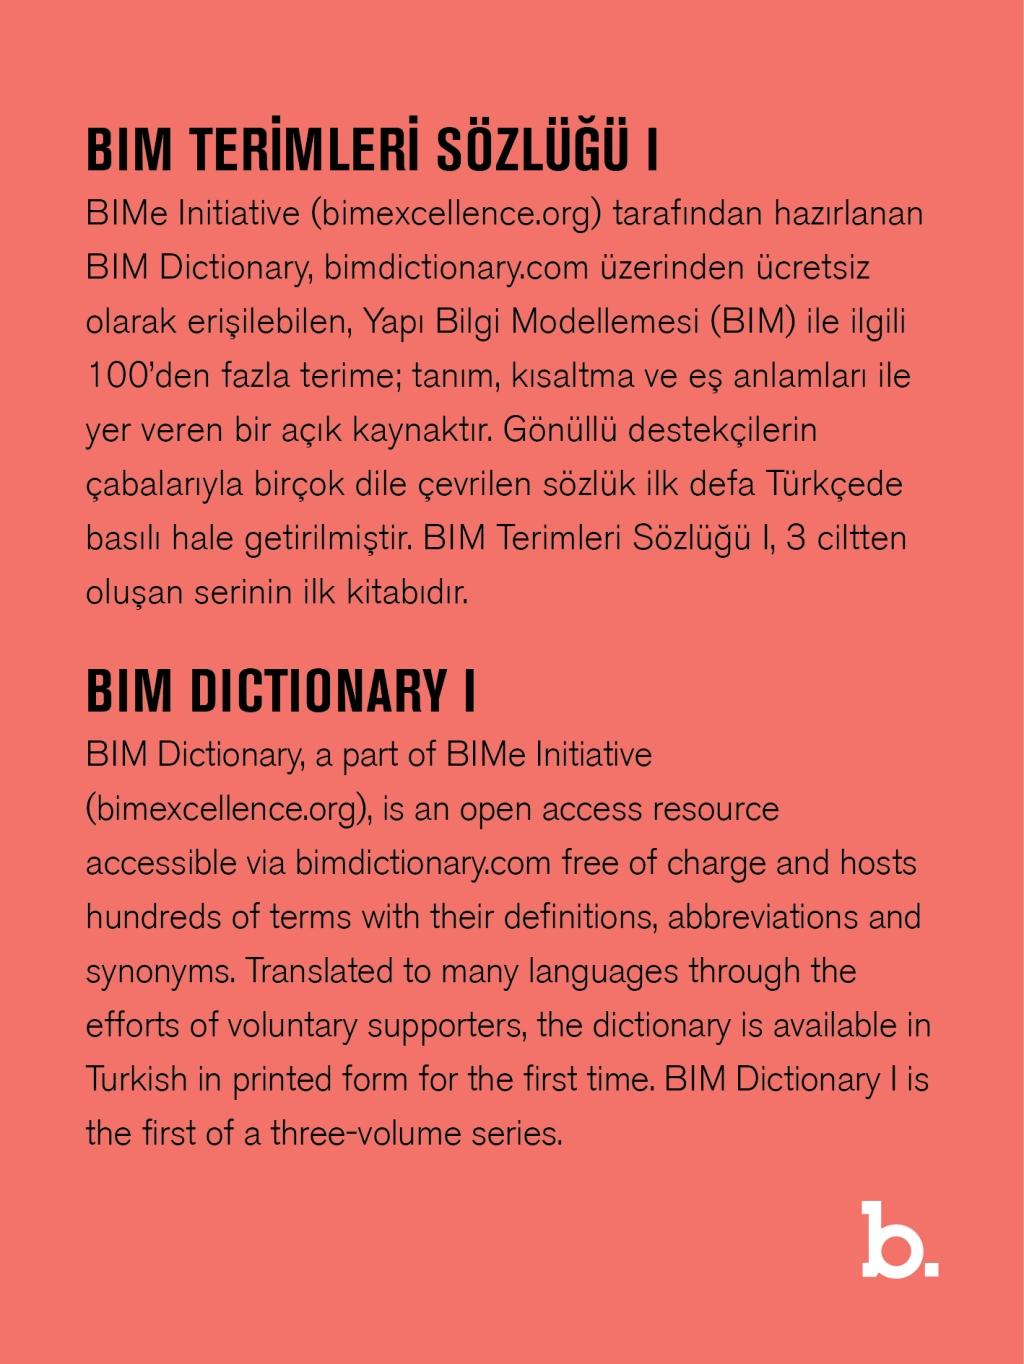 (b. kitap)'tan İKİNCİ Yayın: BIM Terimleri Sözlüğü I